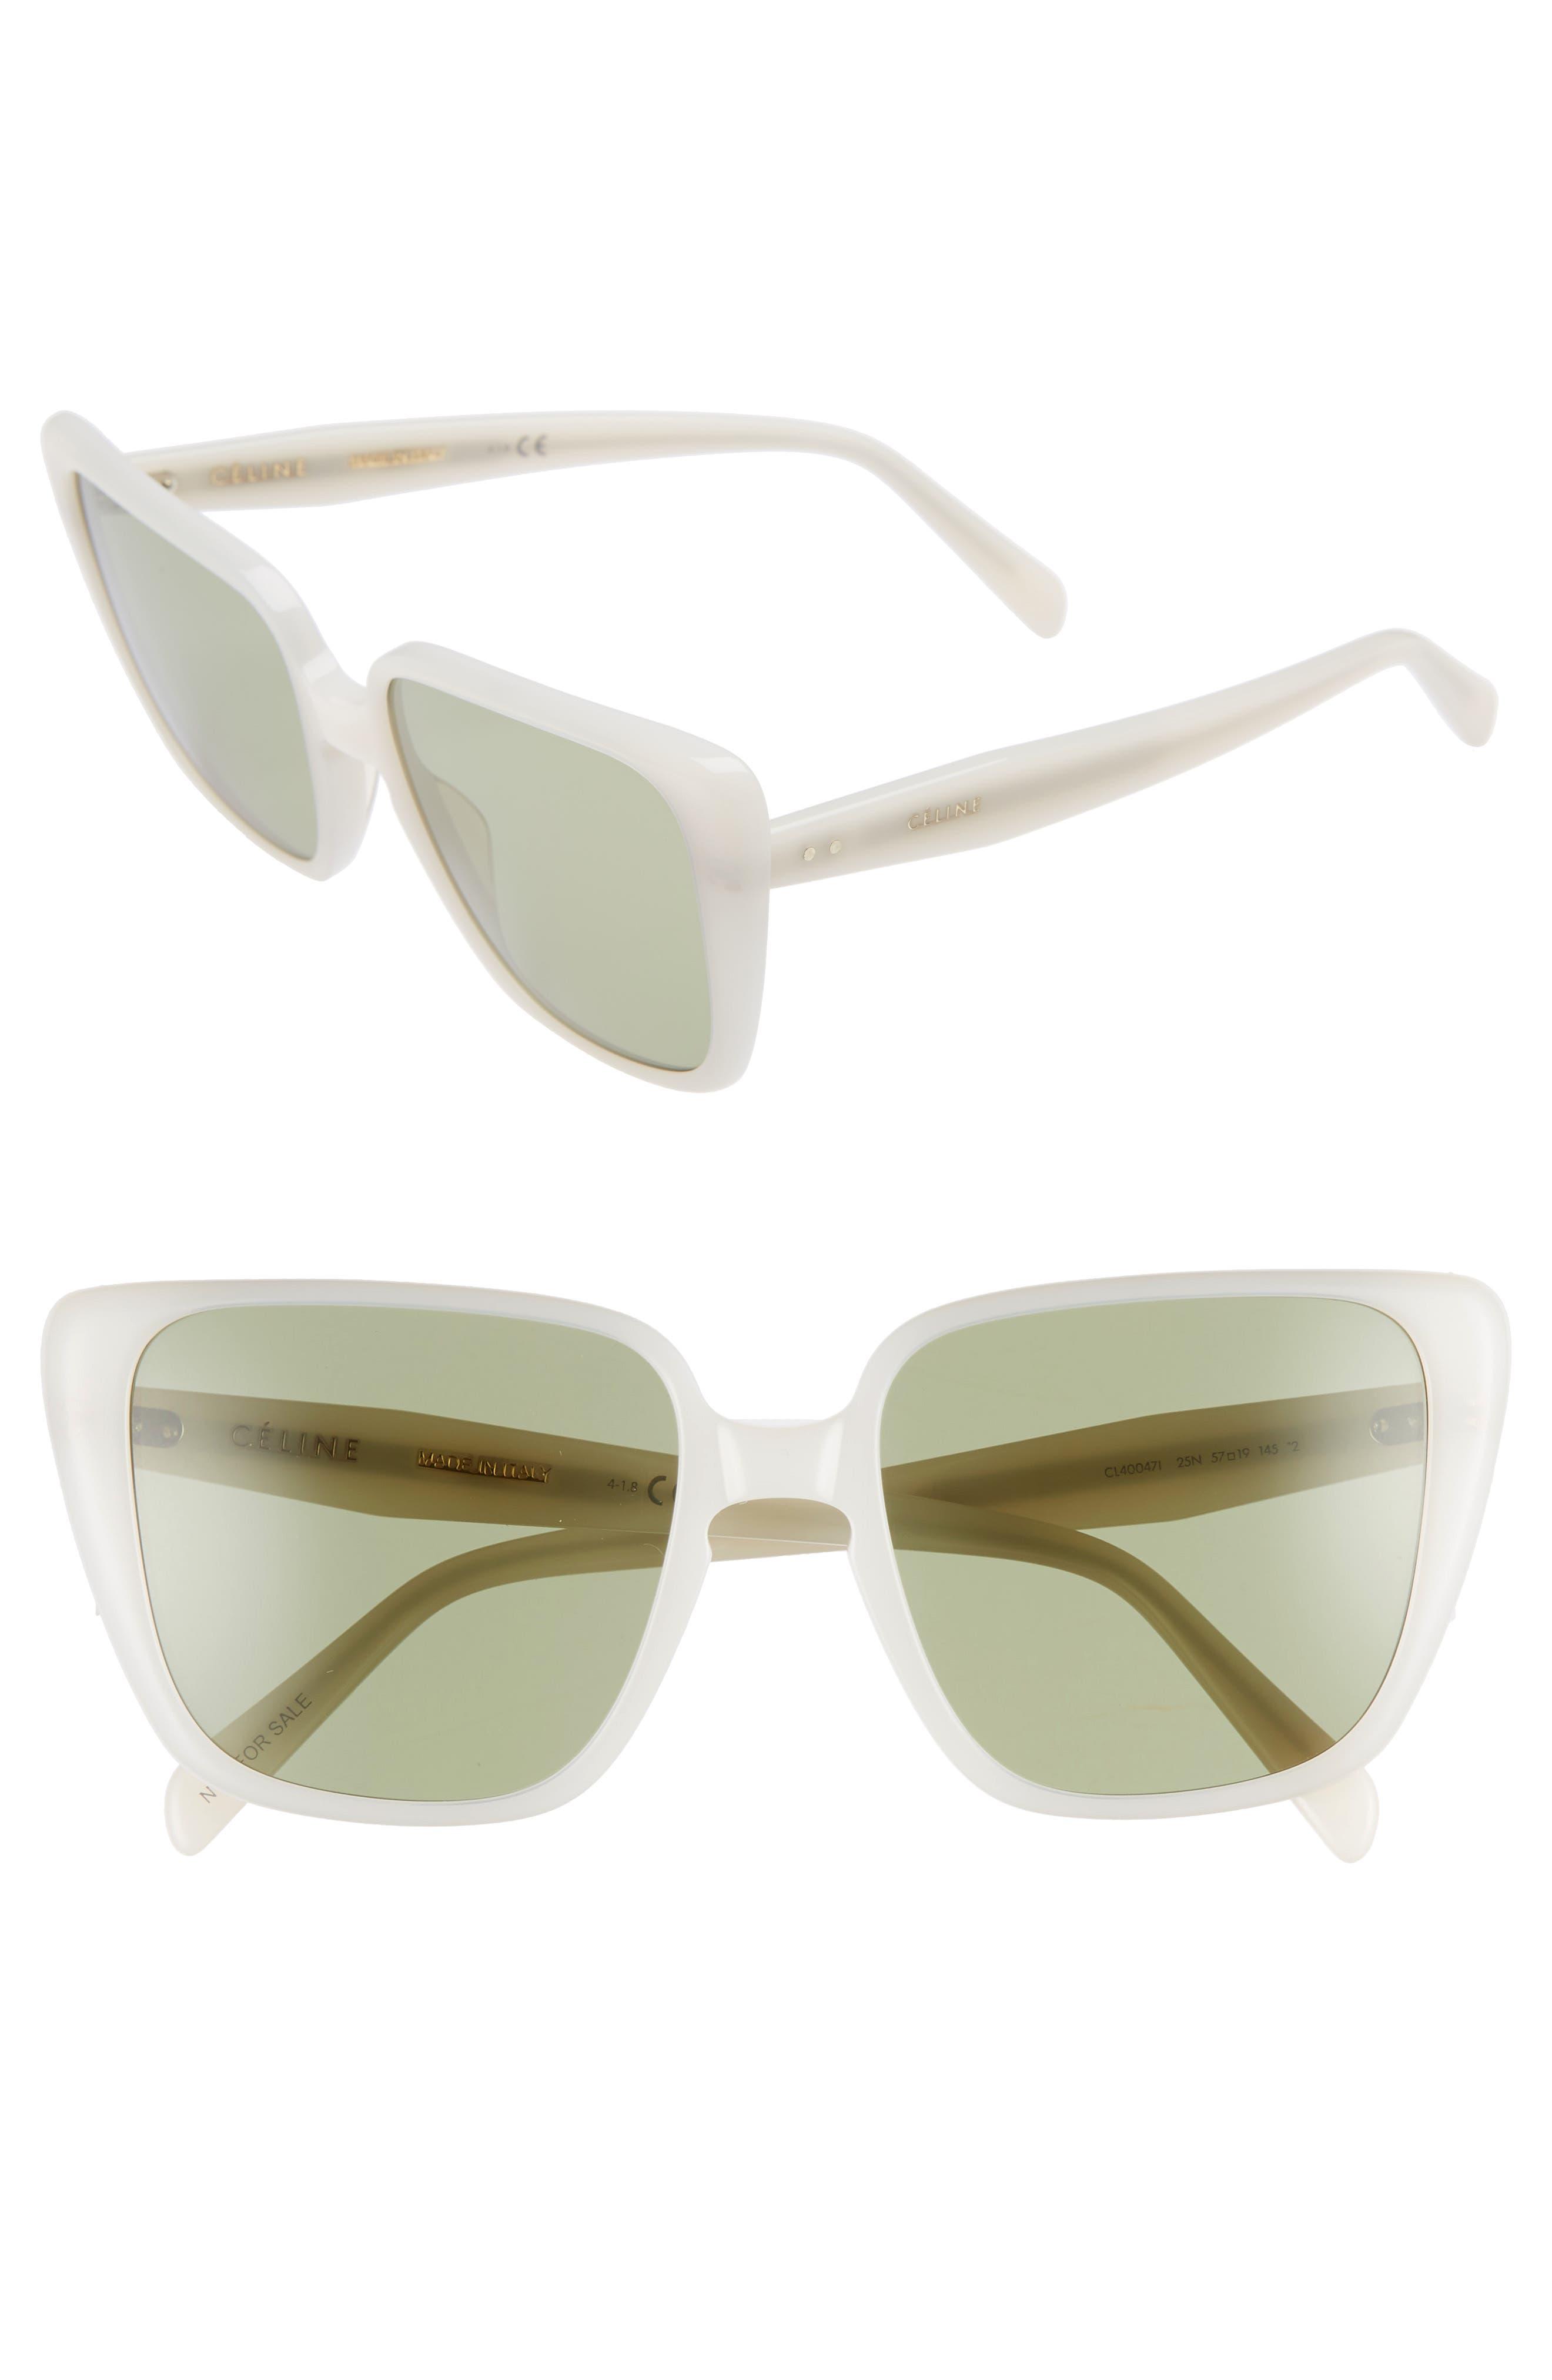 57Mm Modified Square Cat Eye Sunglasses - Milky White Swan